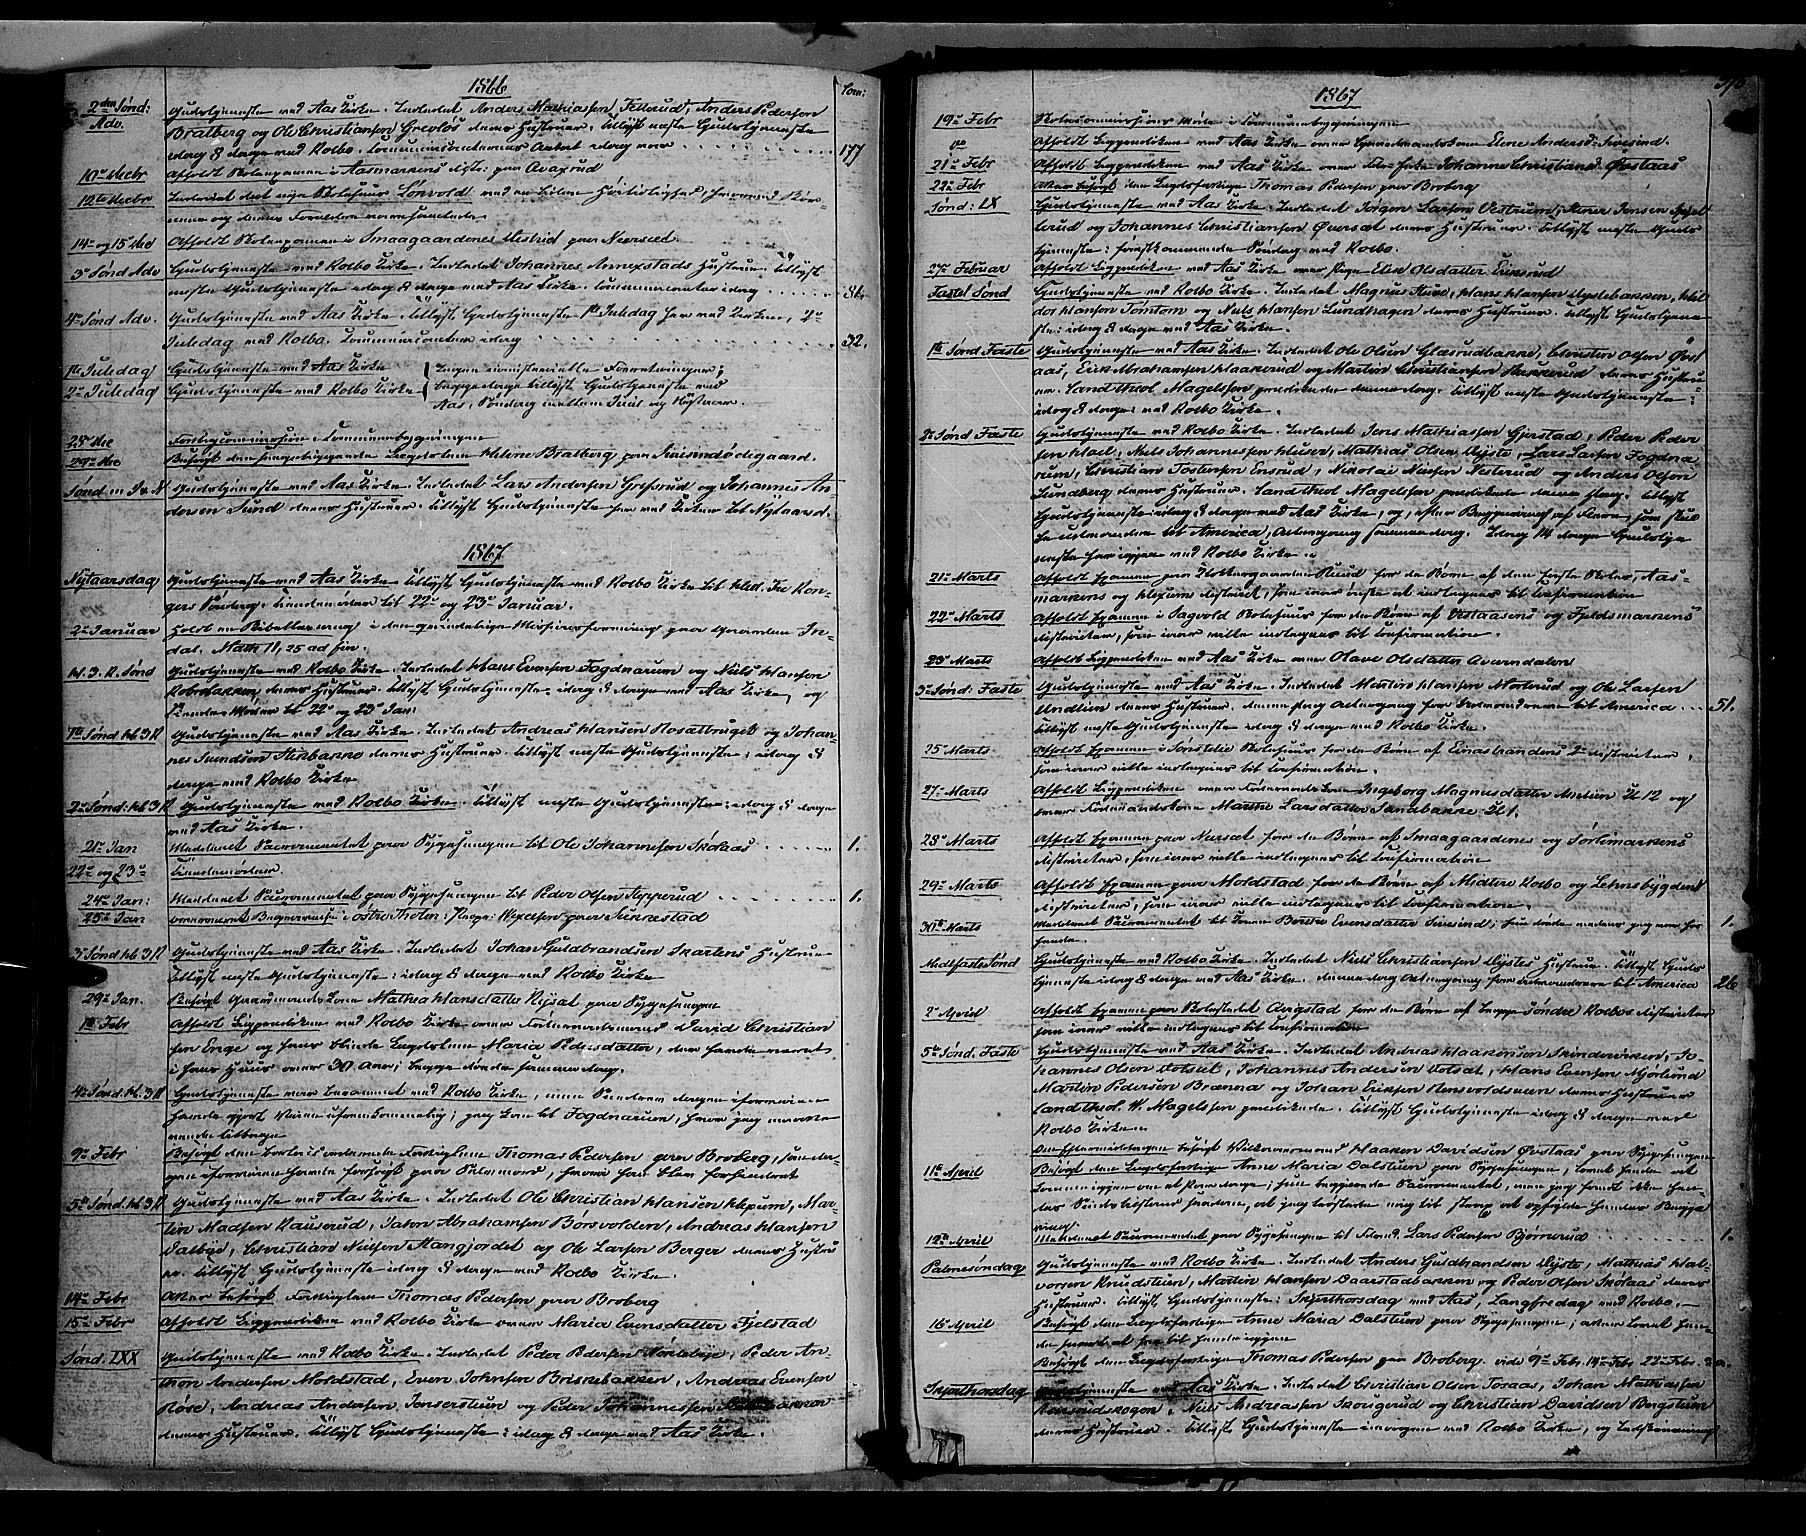 SAH, Vestre Toten prestekontor, H/Ha/Haa/L0007: Ministerialbok nr. 7, 1862-1869, s. 375